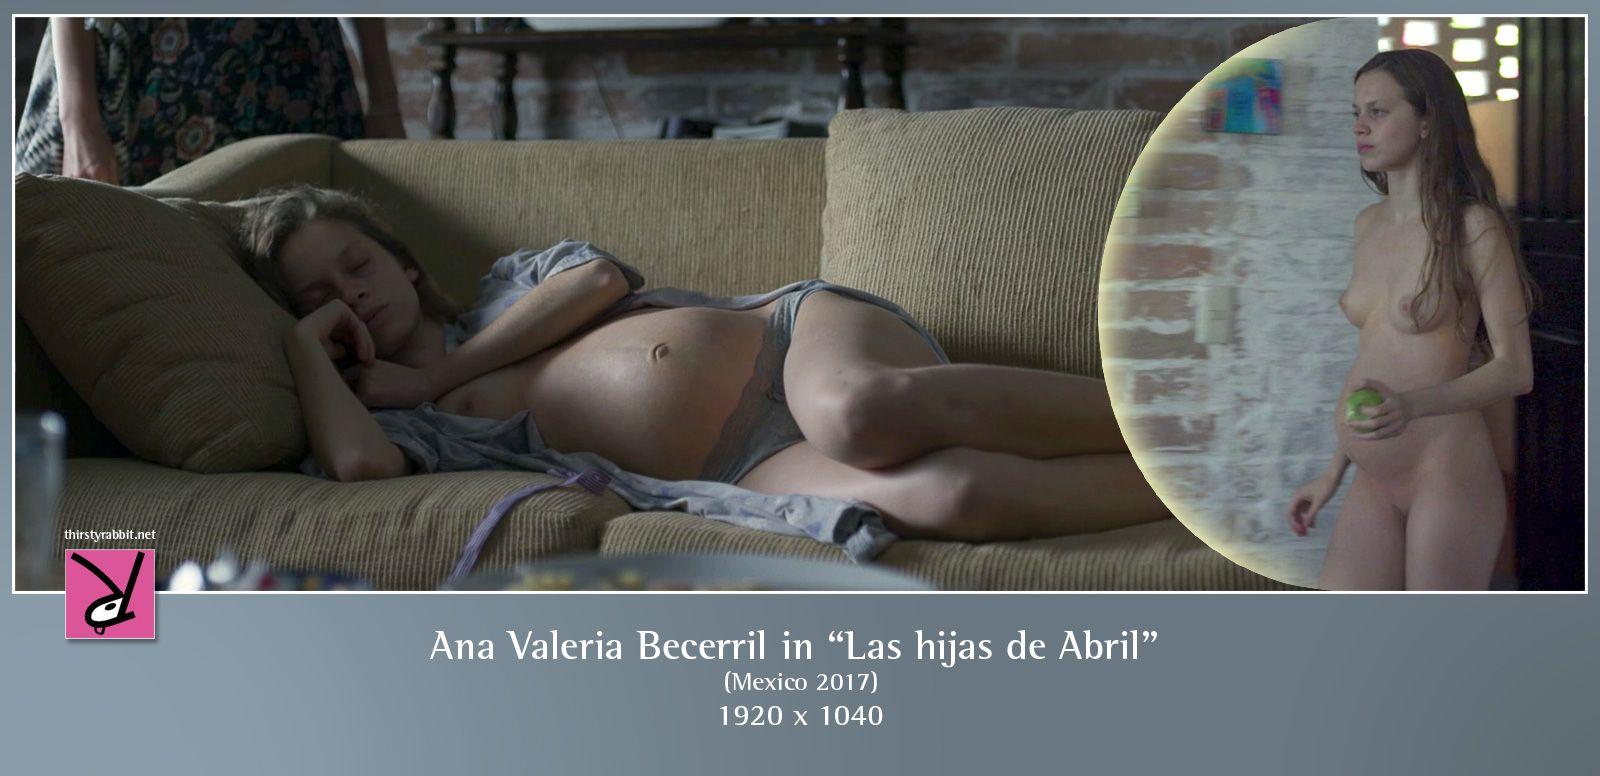 Valeria nackt Ana Becerril  Ana Valeria